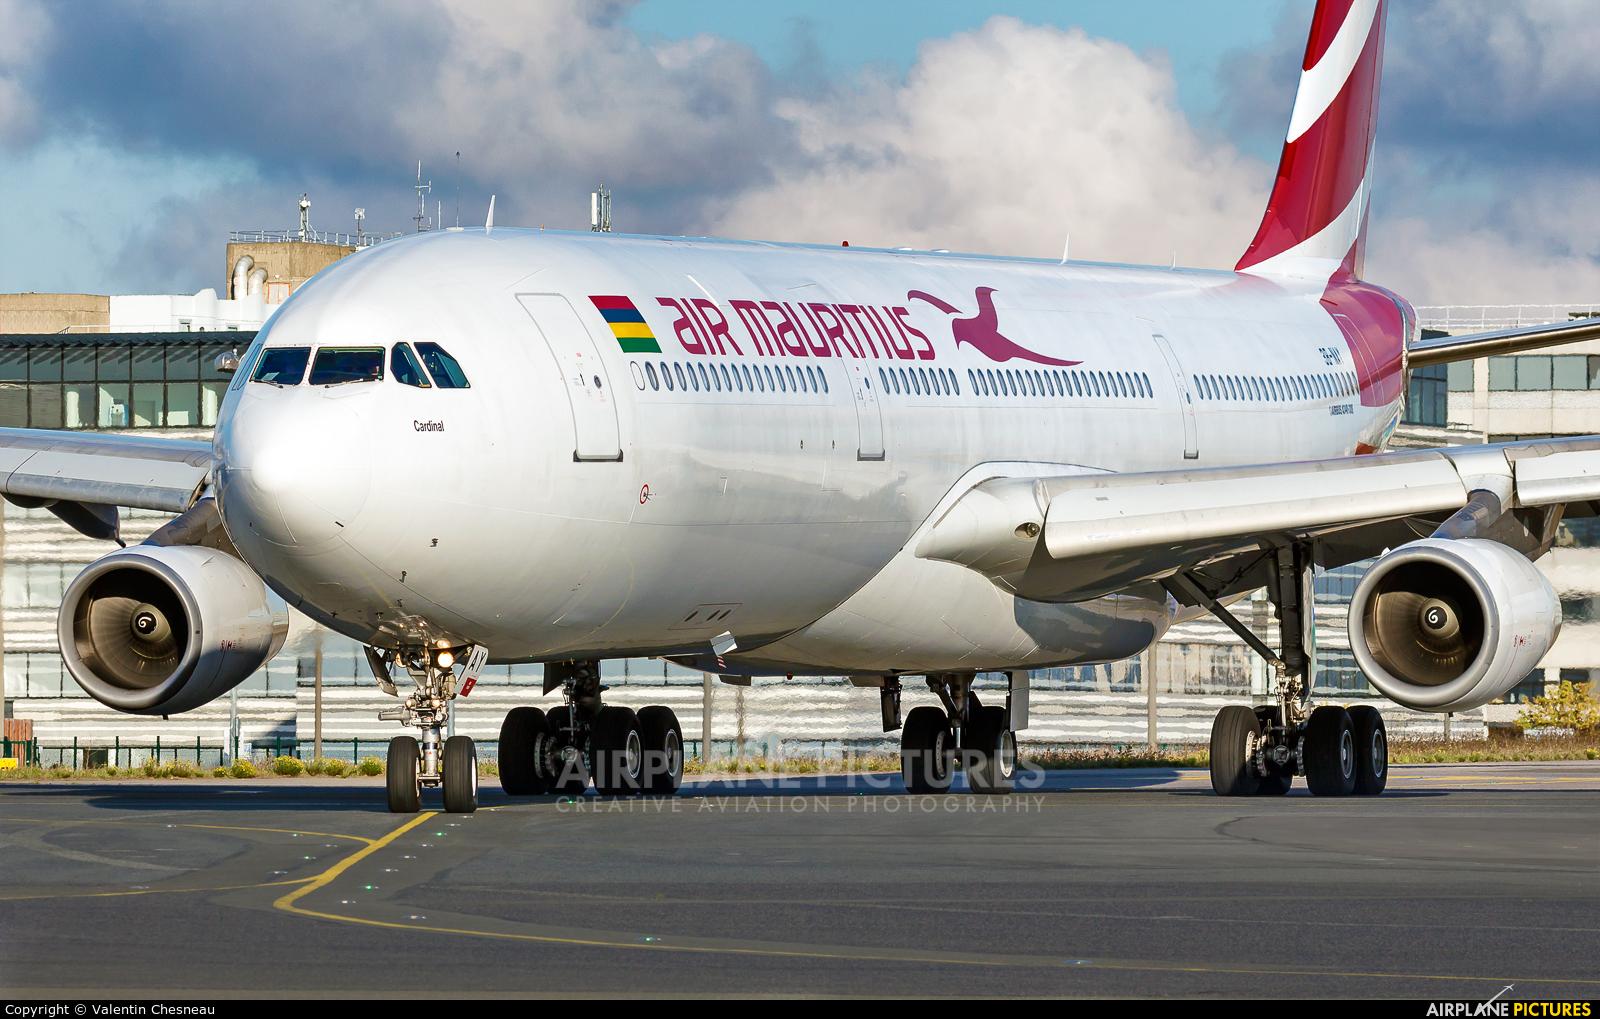 Air Mauritius 3B-NAY aircraft at Paris - Charles de Gaulle